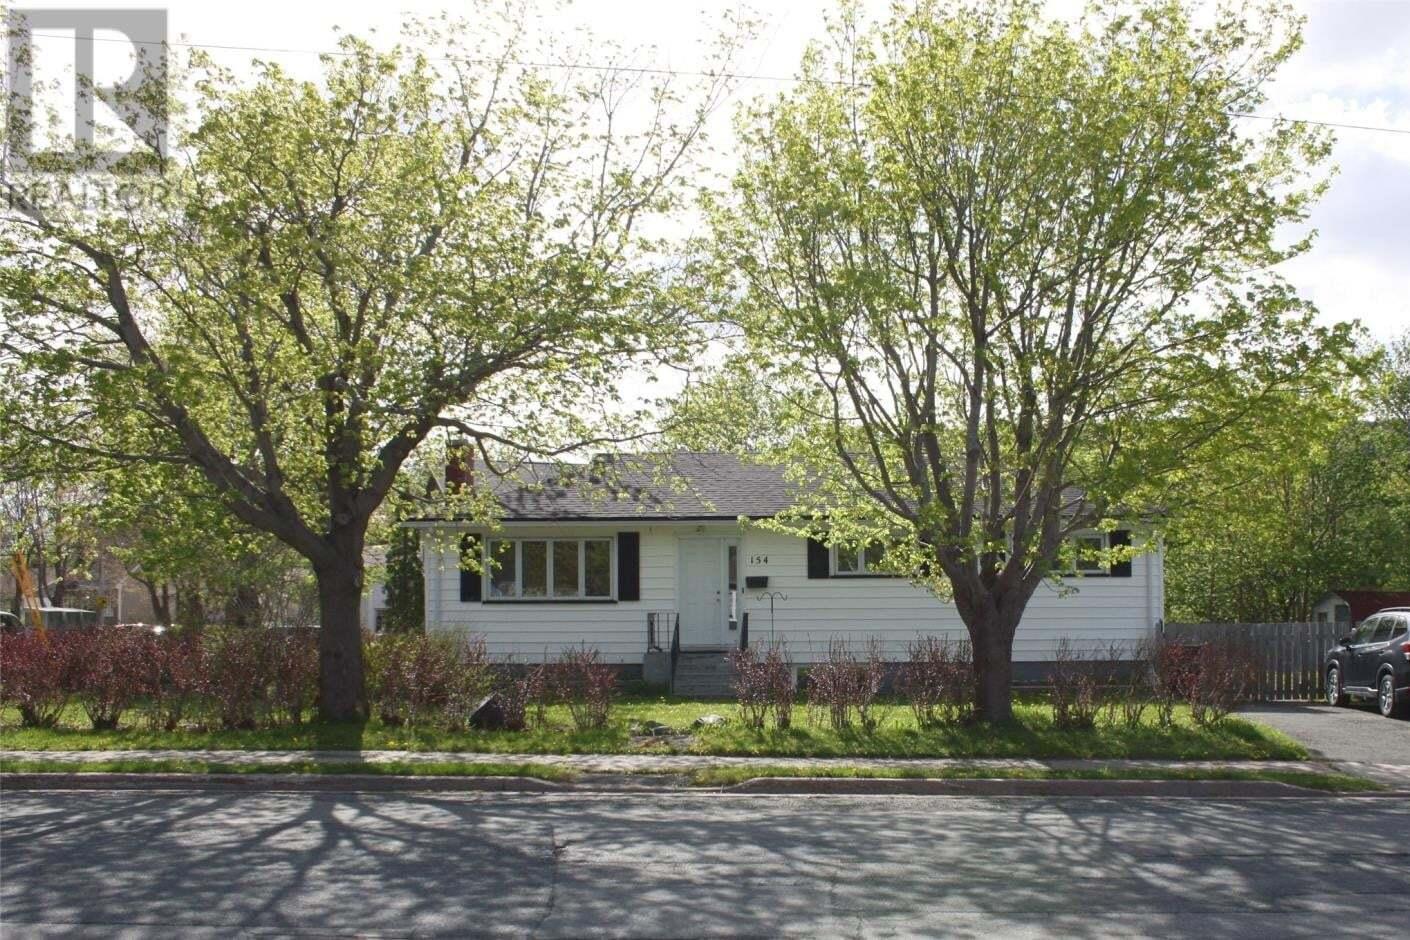 House for sale at 154 University Ave St. John's Newfoundland - MLS: 1214683